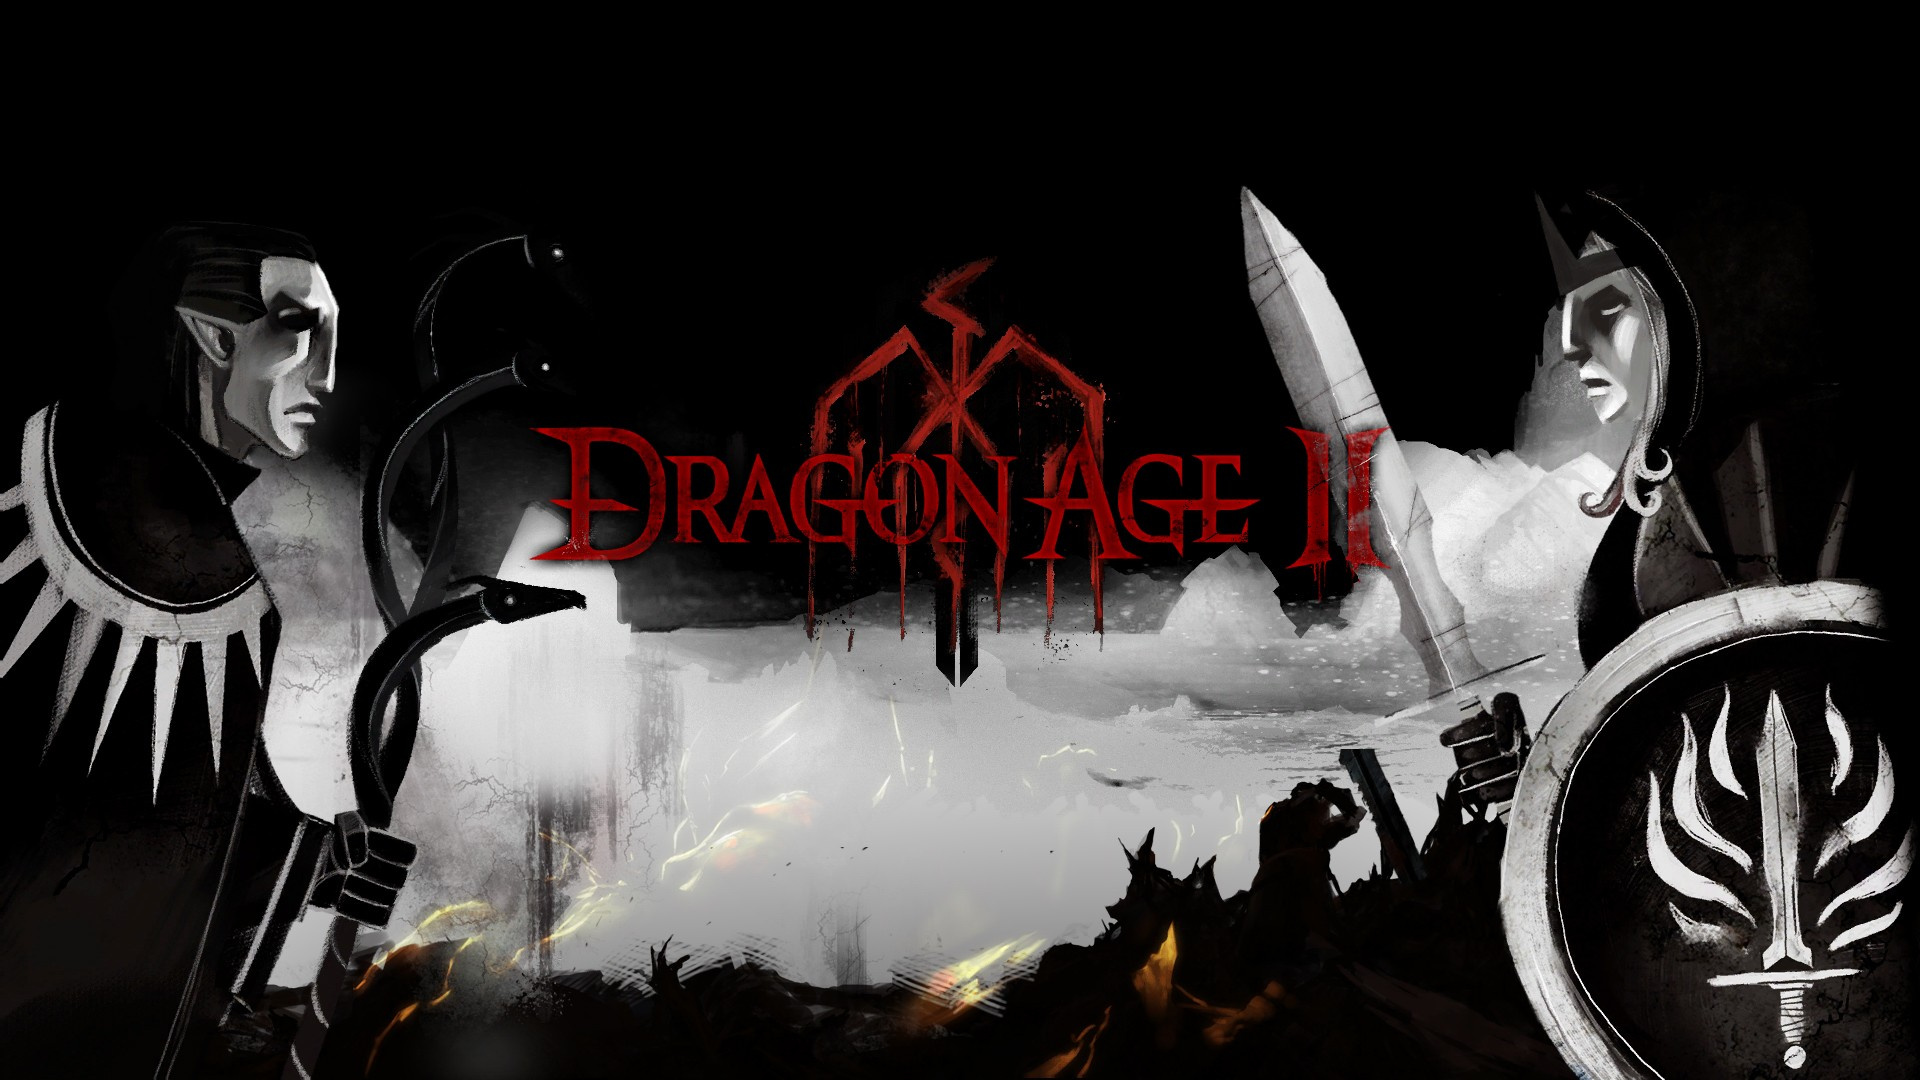 Dragon Age Ii Hd Wallpaper Background Image 1920x1080 Id